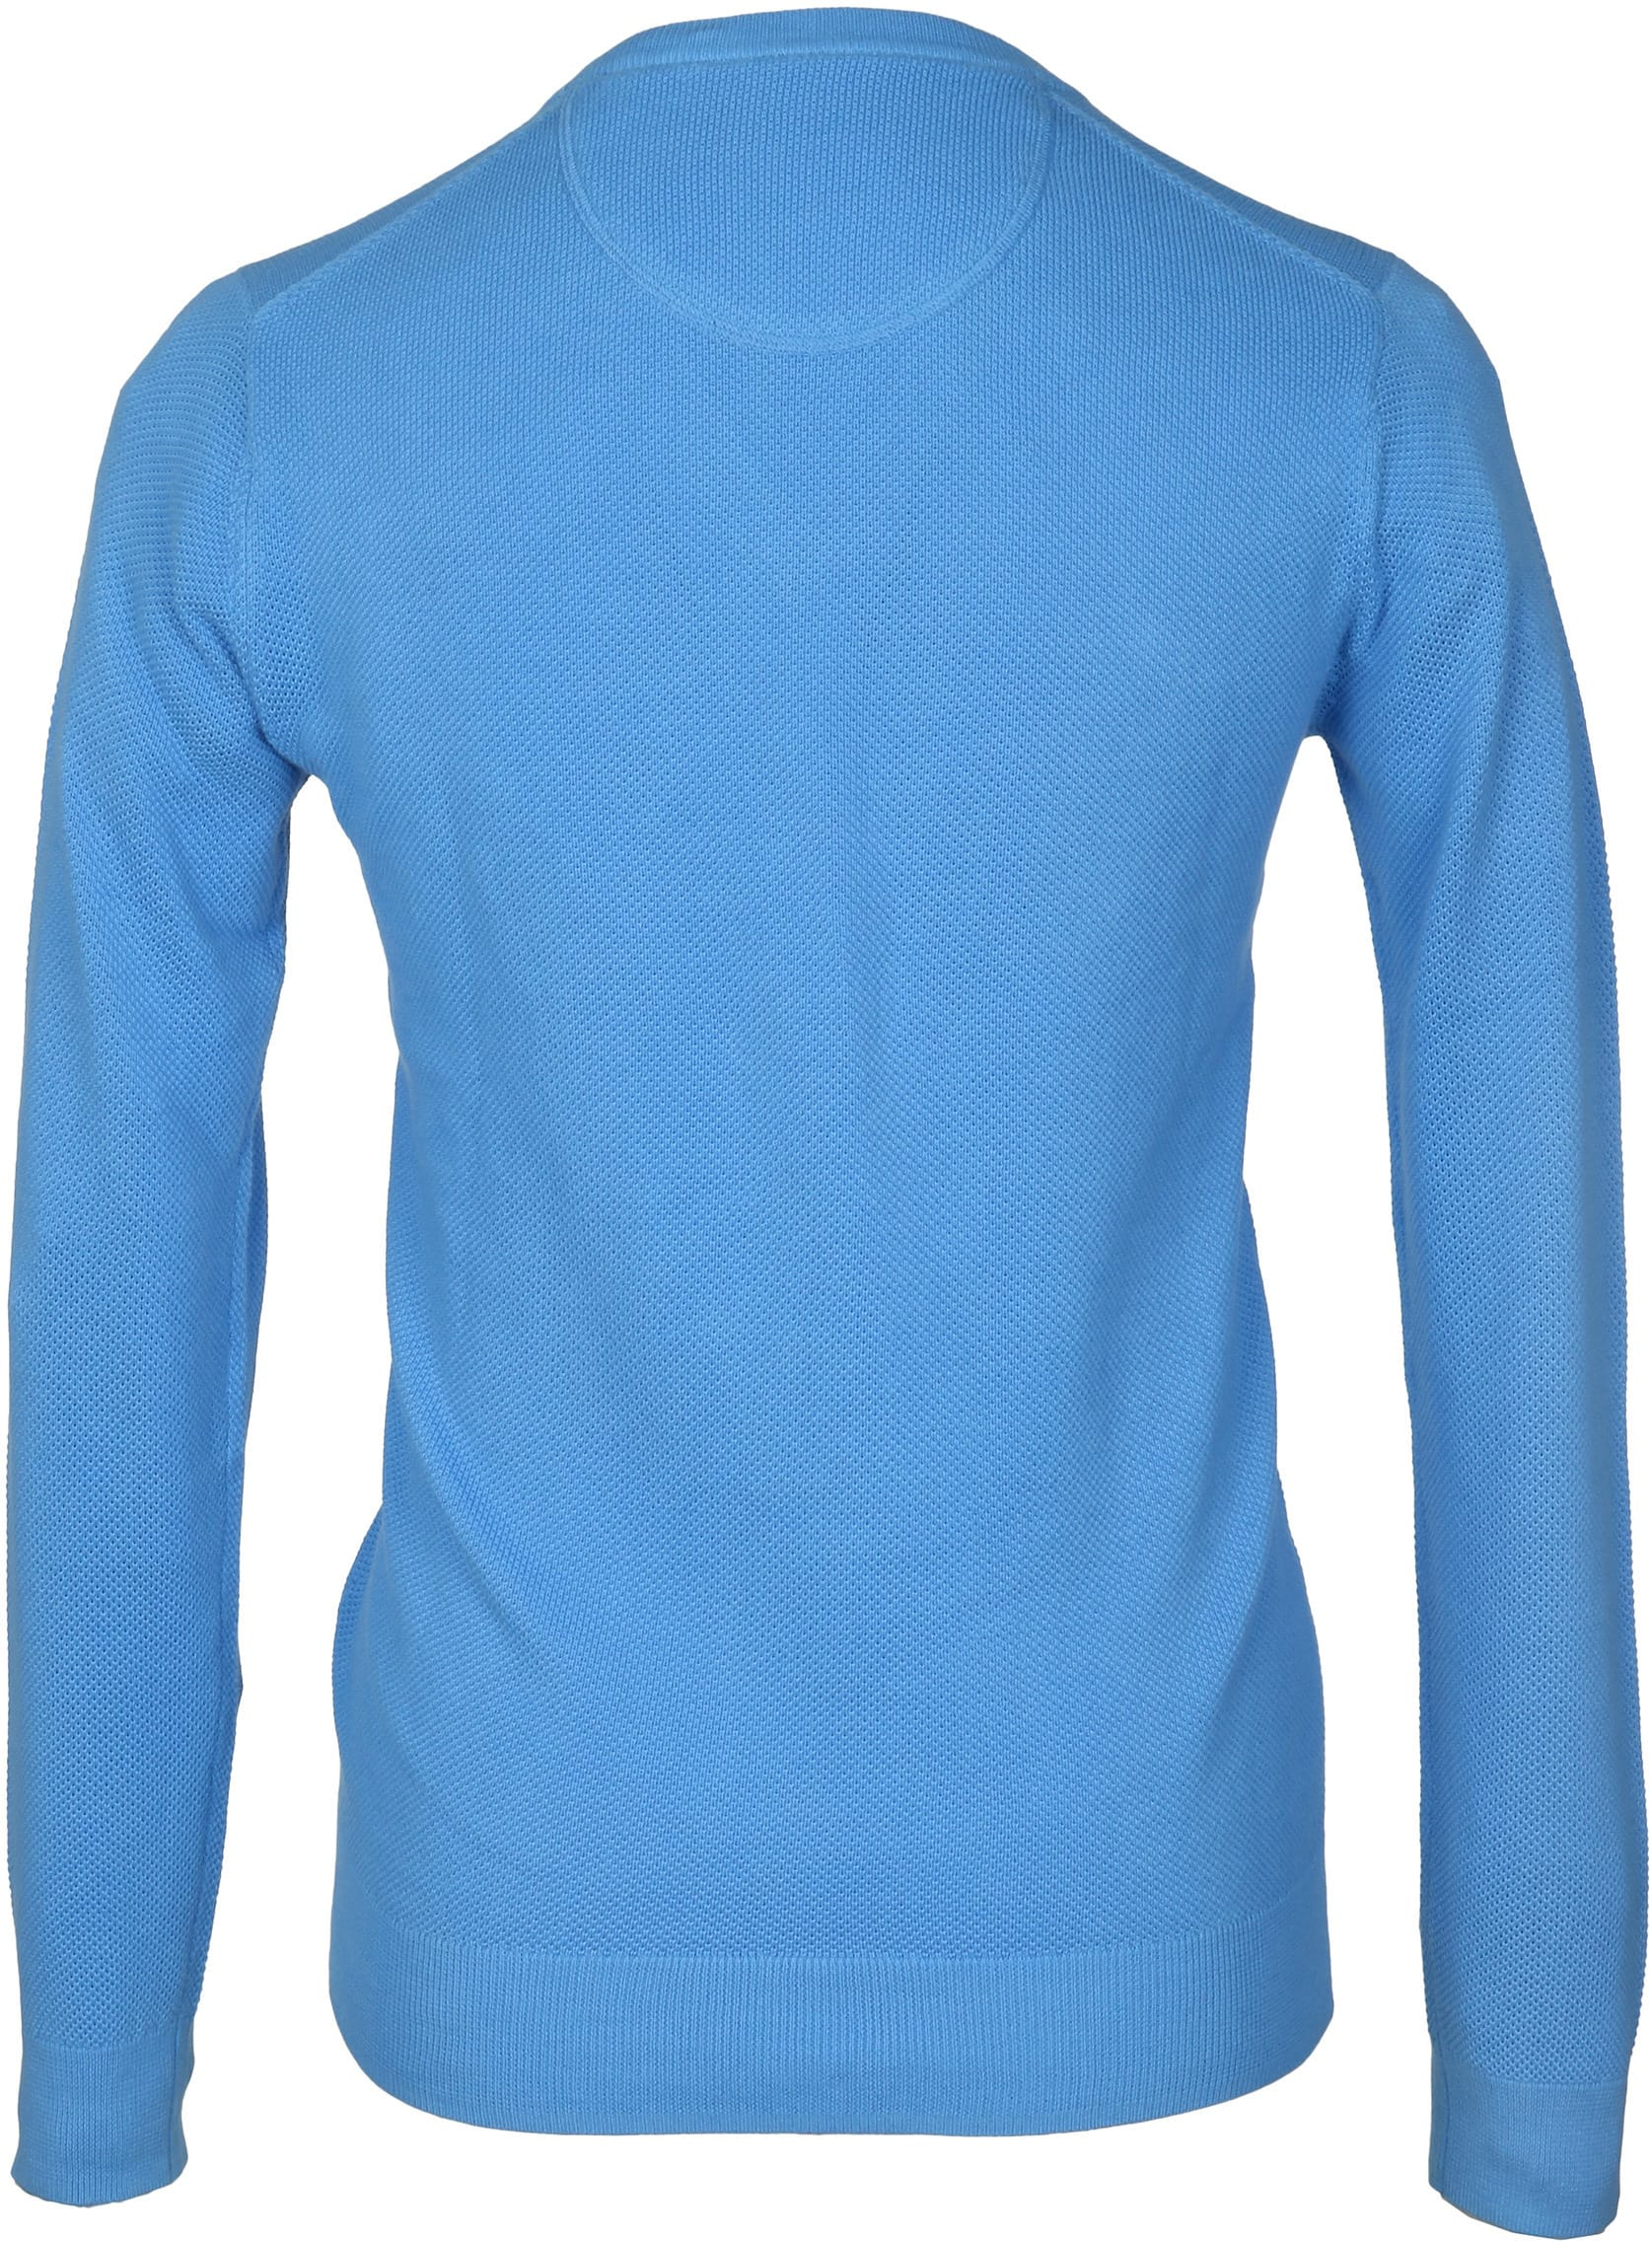 Gant Pullover V-Hals Blauw foto 2